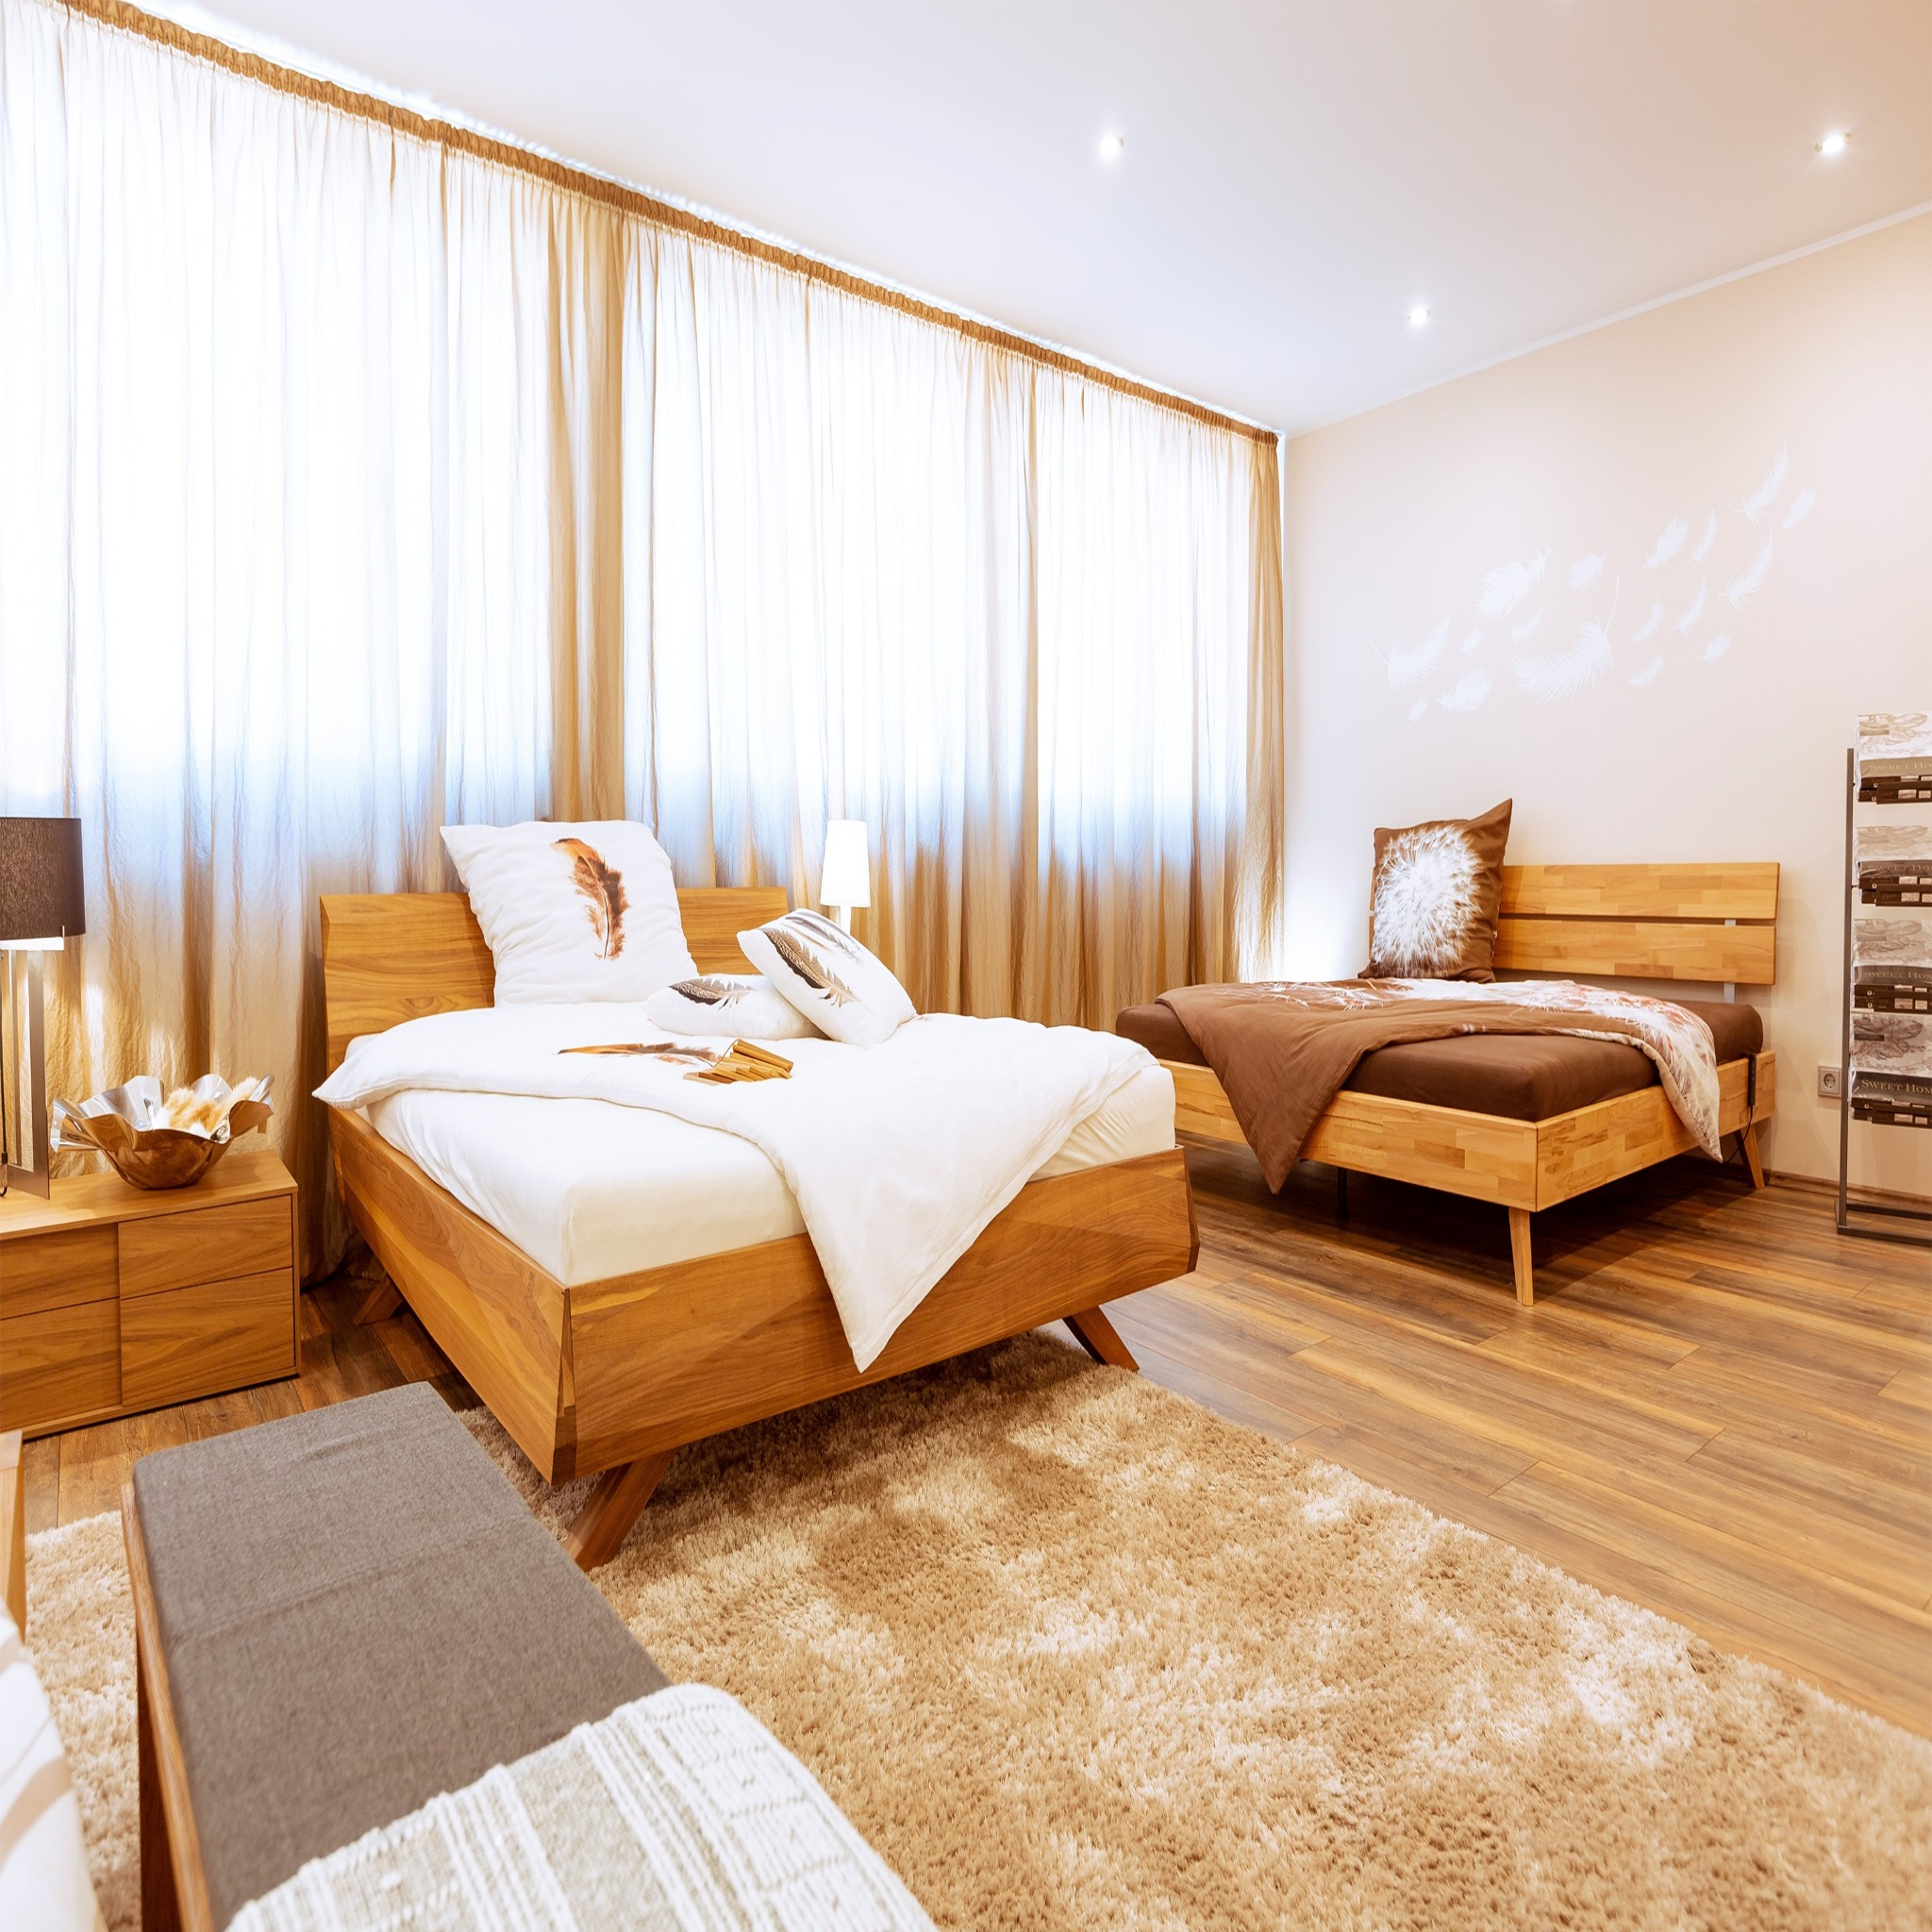 Bild der Betten Bormann - Dortmund